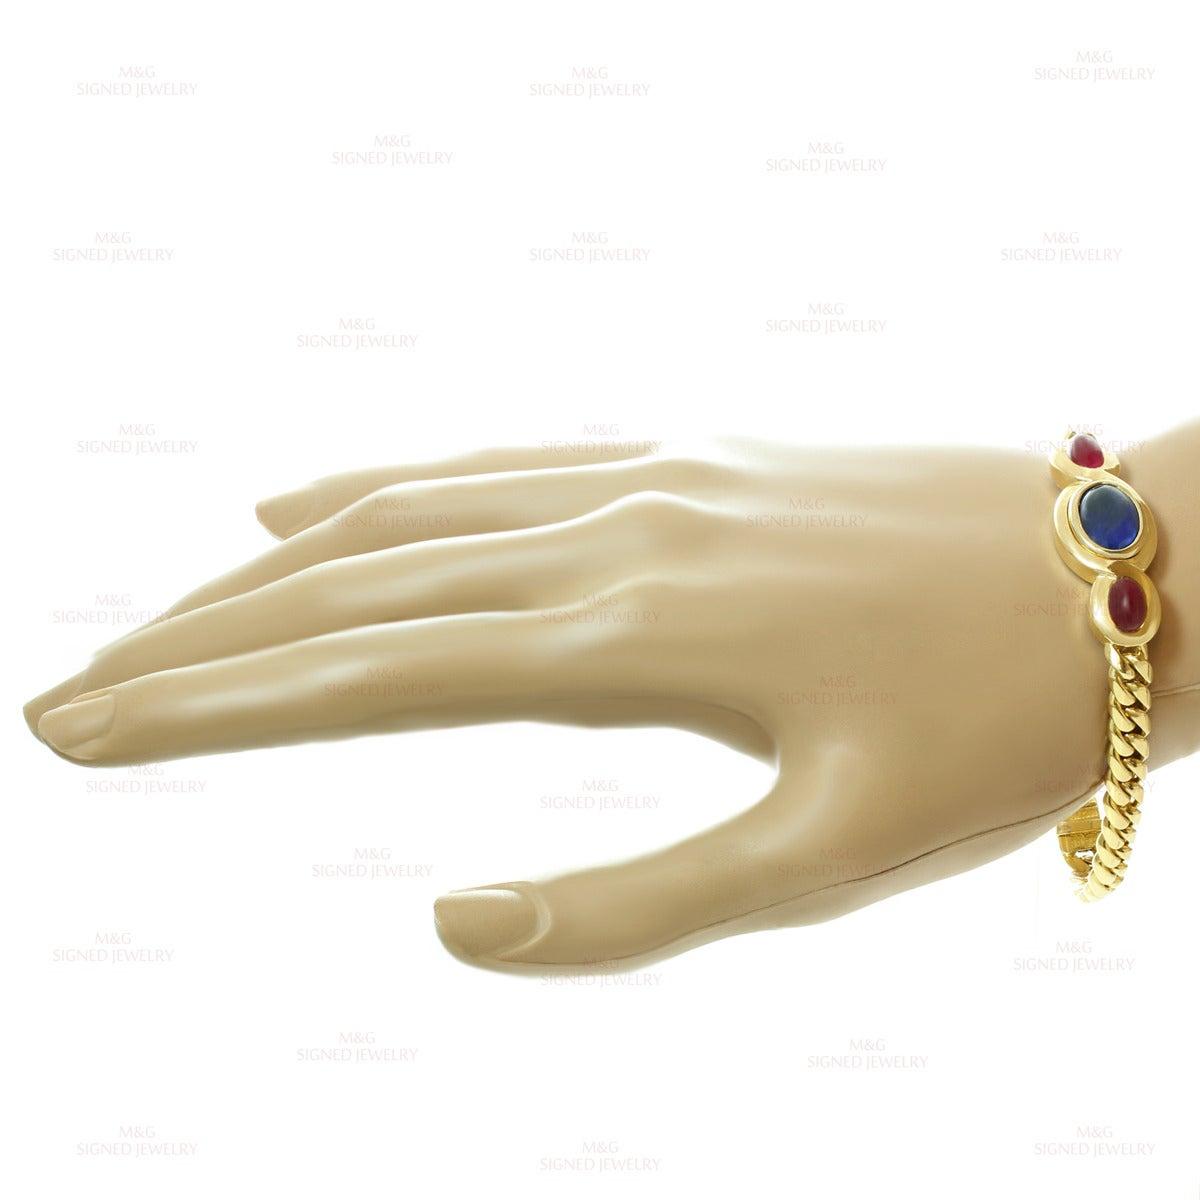 1980s Bulgari Classic Sapphire Ruby Gold Link Interchangeable Bracelet Necklace 4